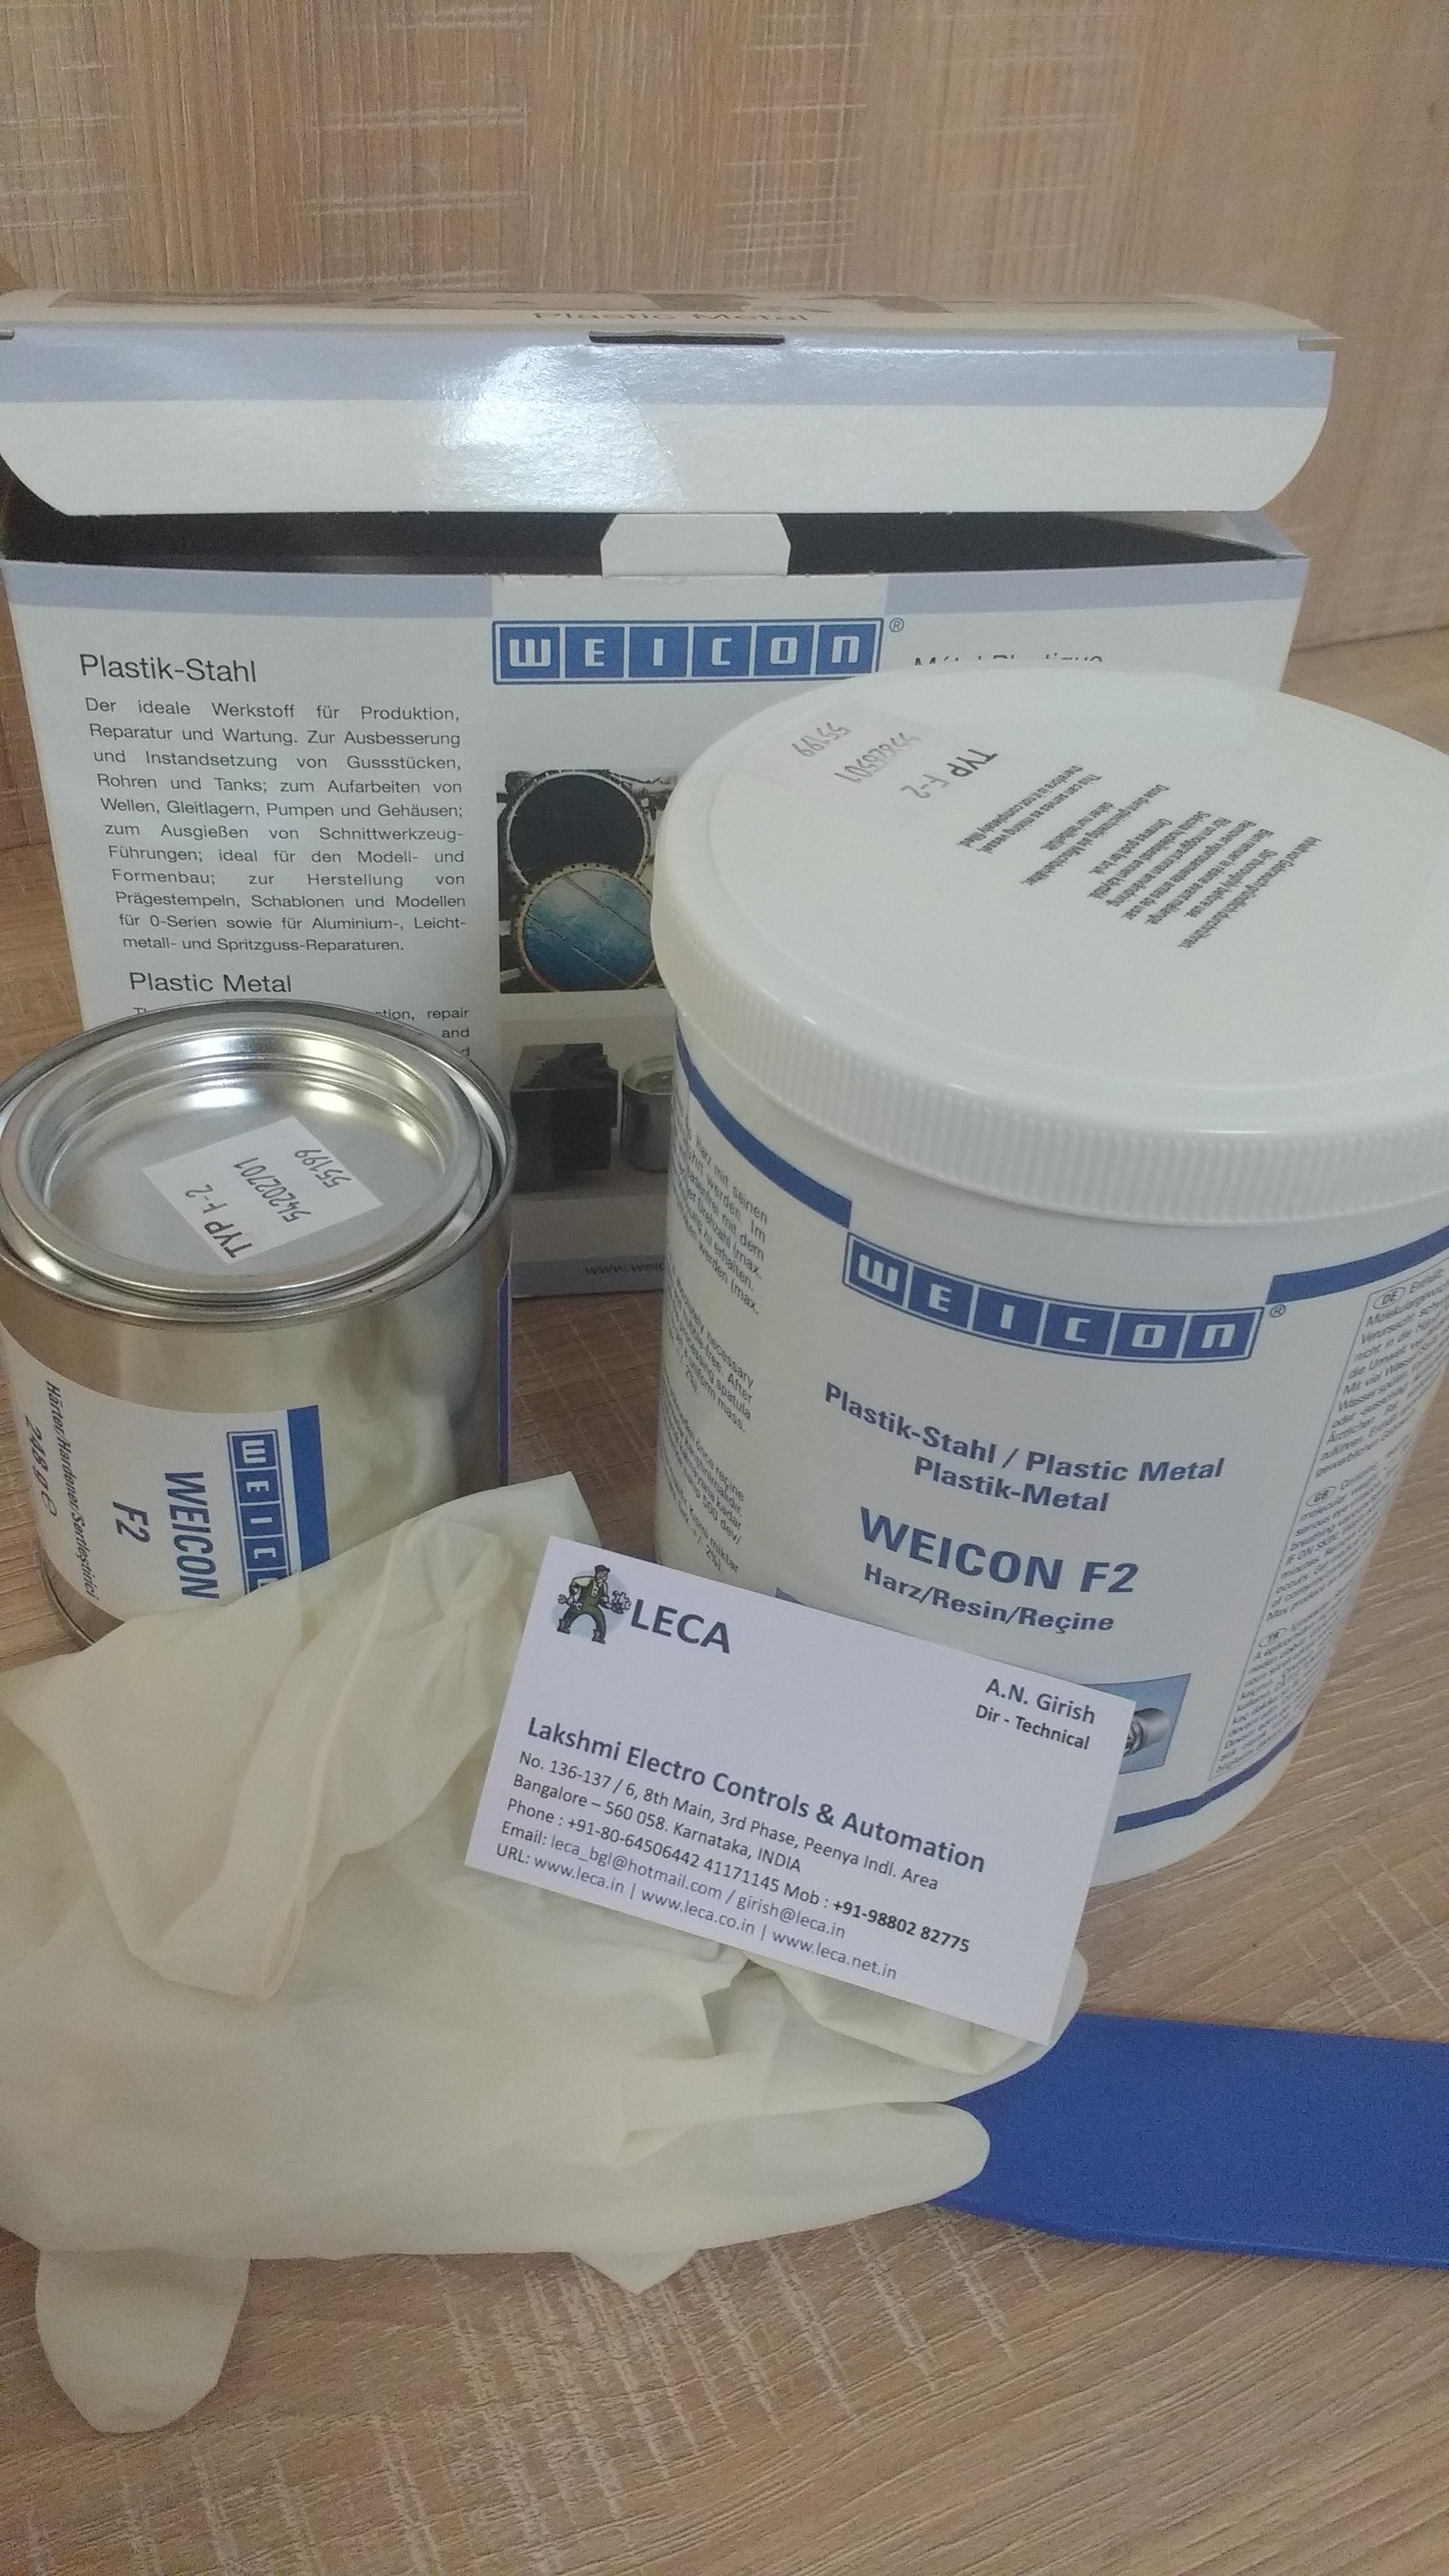 WEICON Plastic Metal F2